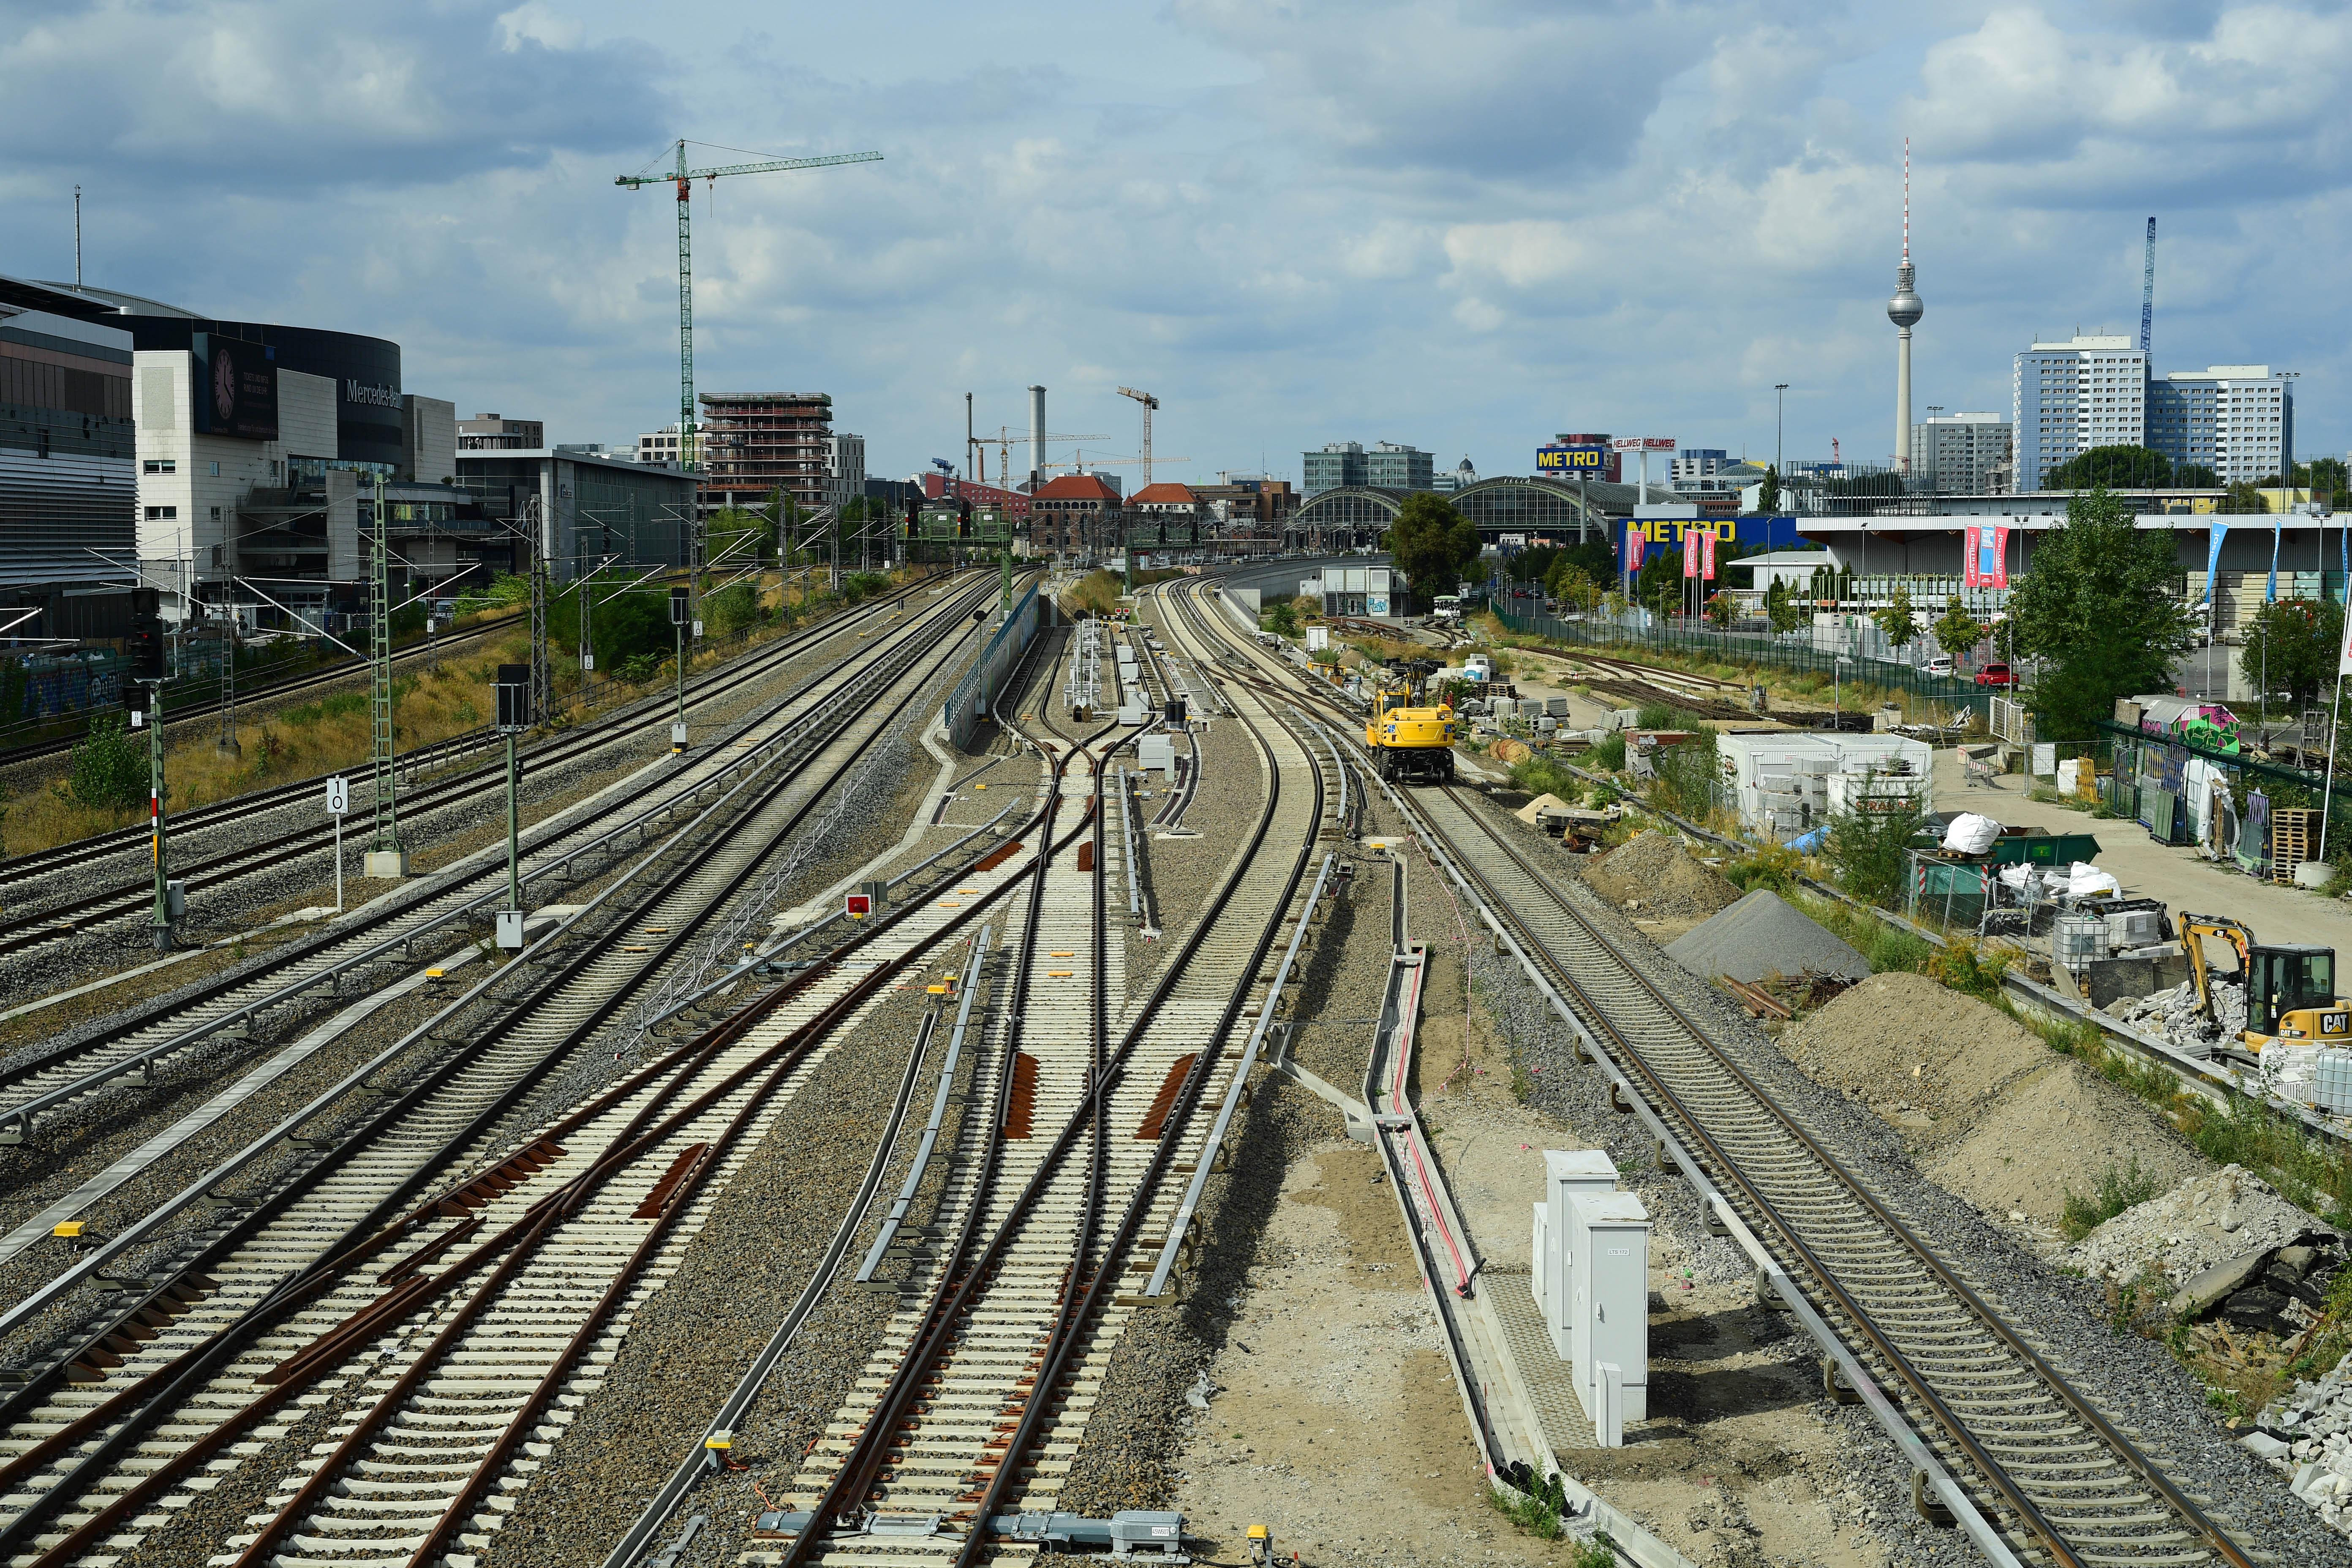 DG308400. Rebuilding the lines between Ostbahnhof and Warschauer Strasse stations. Berlin. Germany. 17.9.18cropp